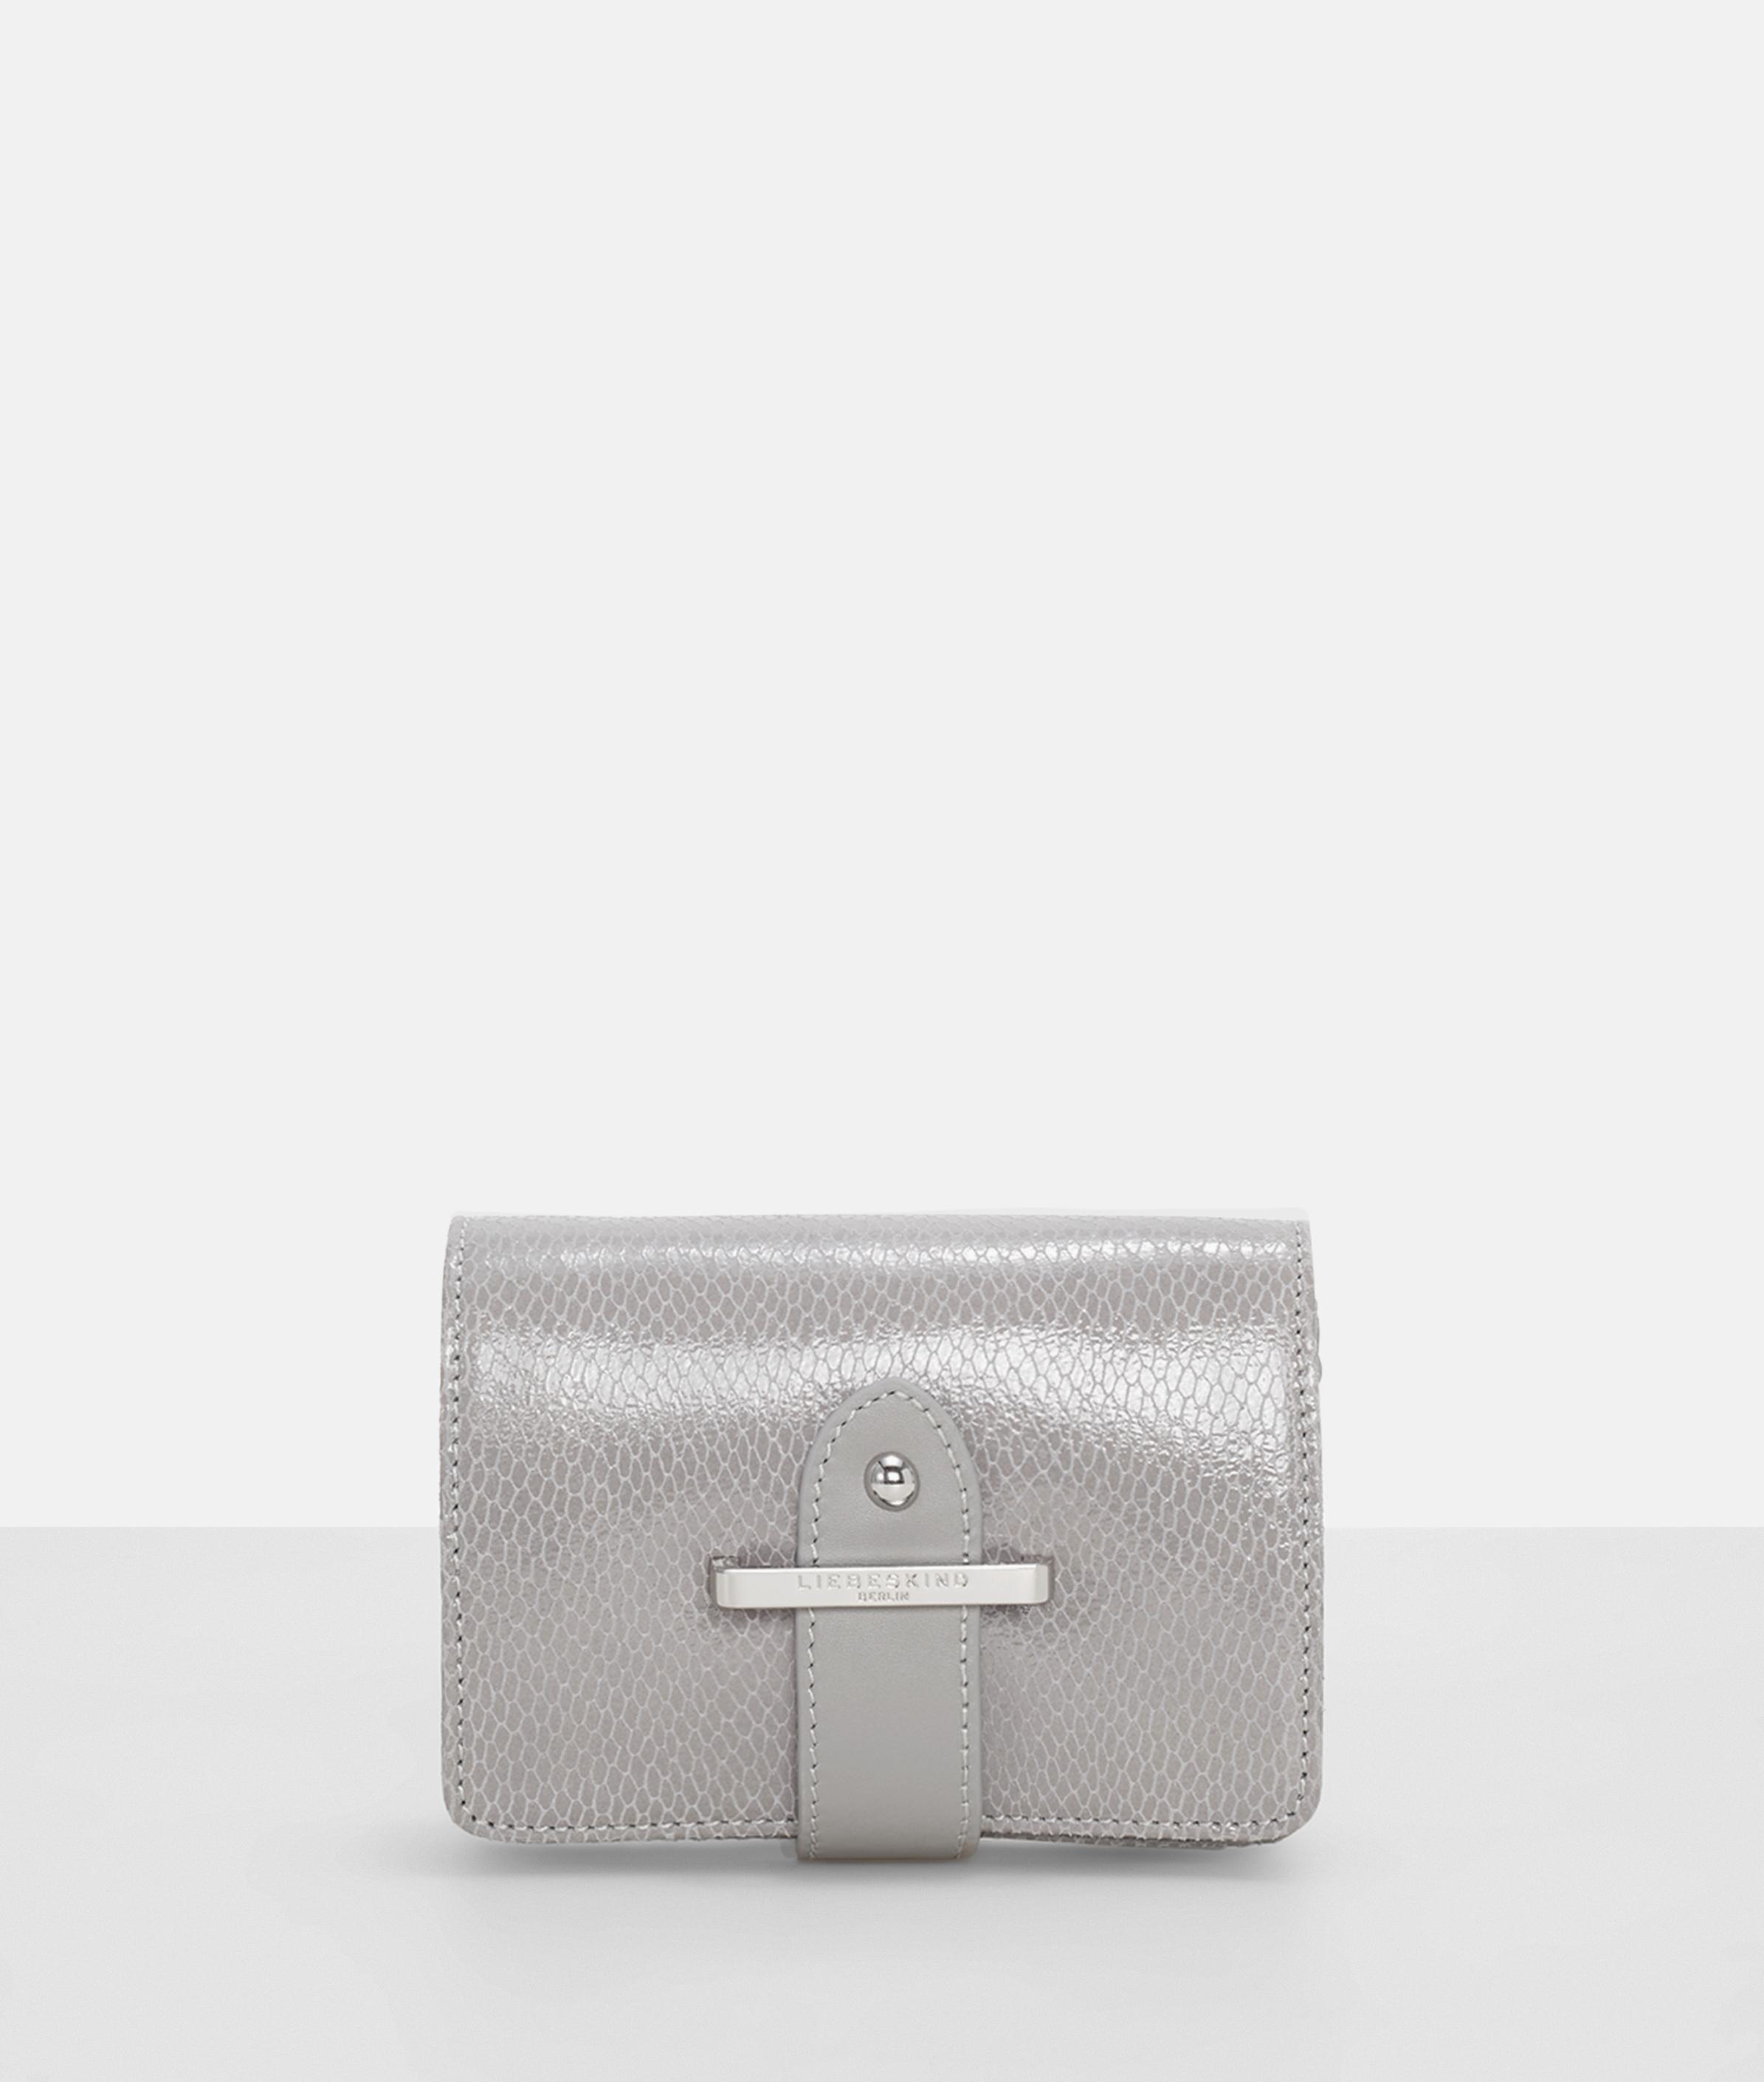 liebeskind berlin - Tasche Berna, Grau/Schwarz